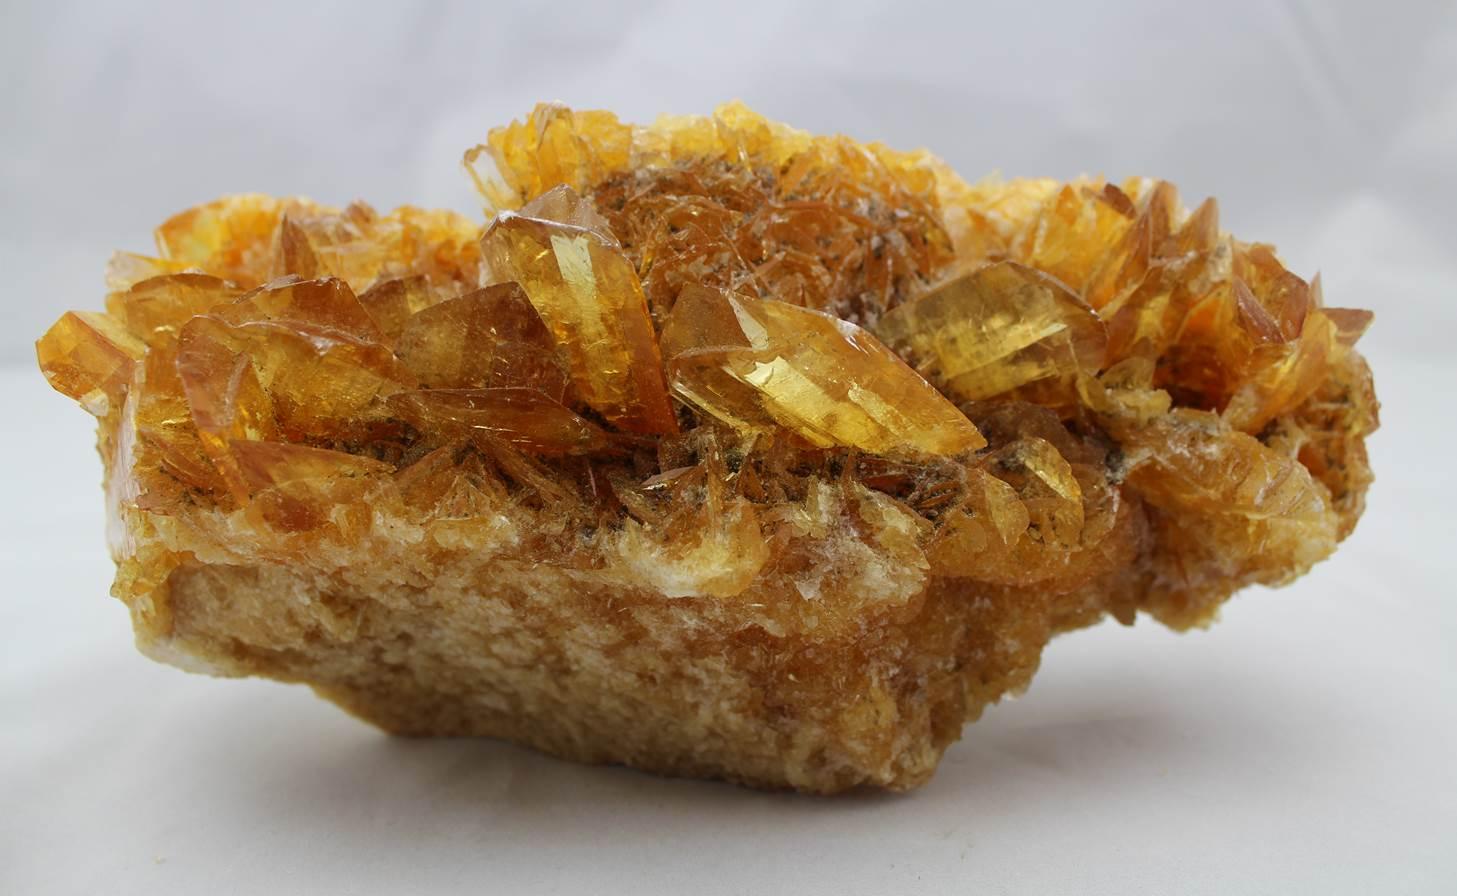 Selenite Crystal Mineral Specimen